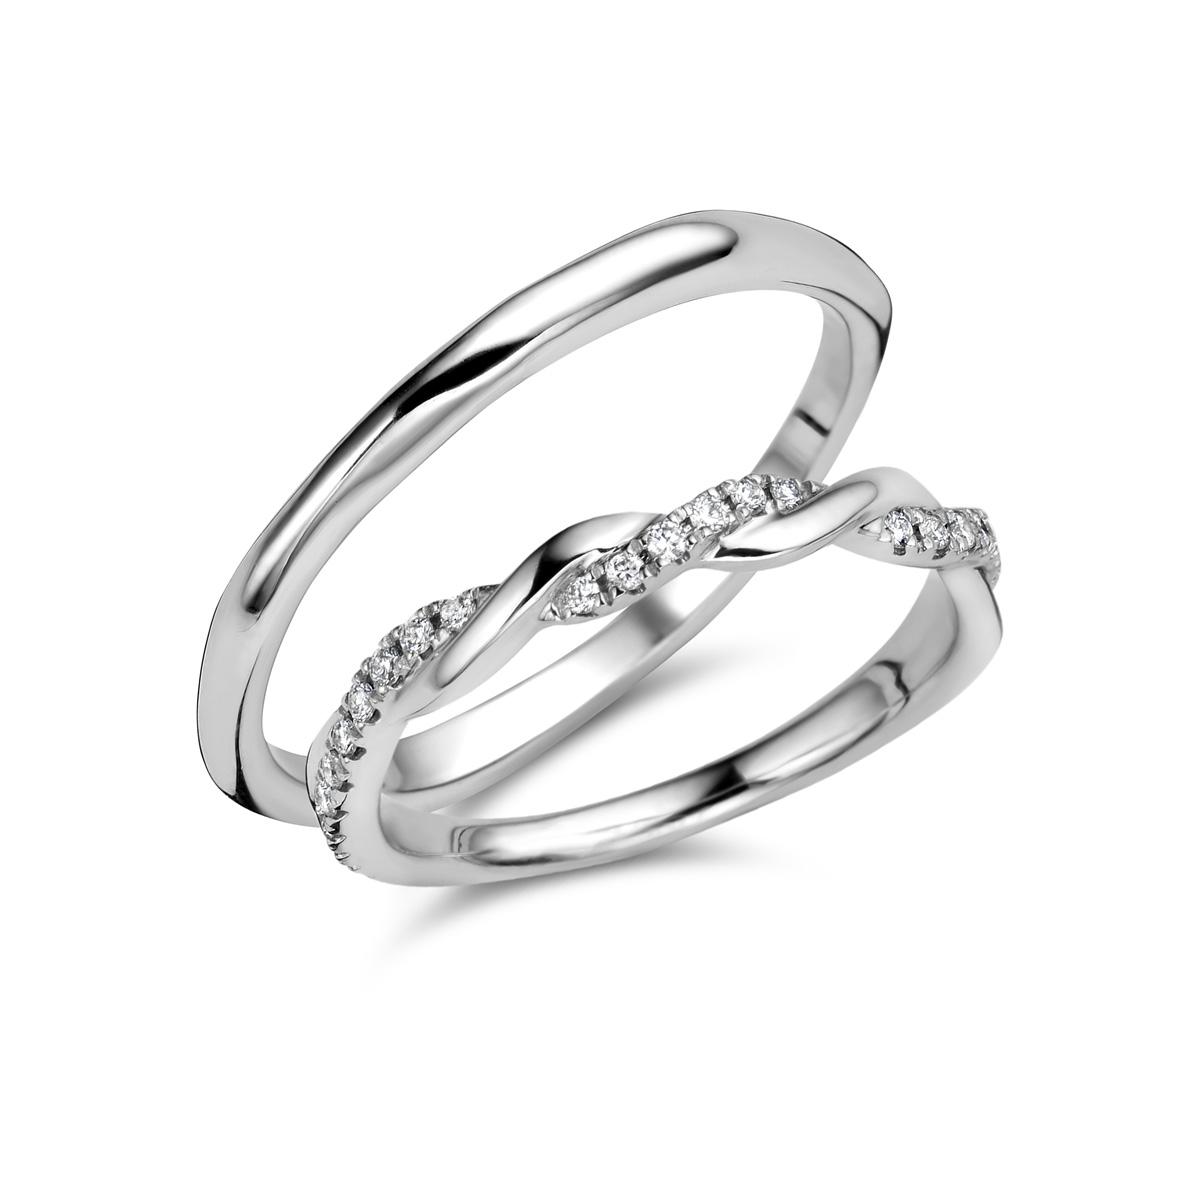 De Bruyloft trouwringen: B-RM182176-AD8825_W9